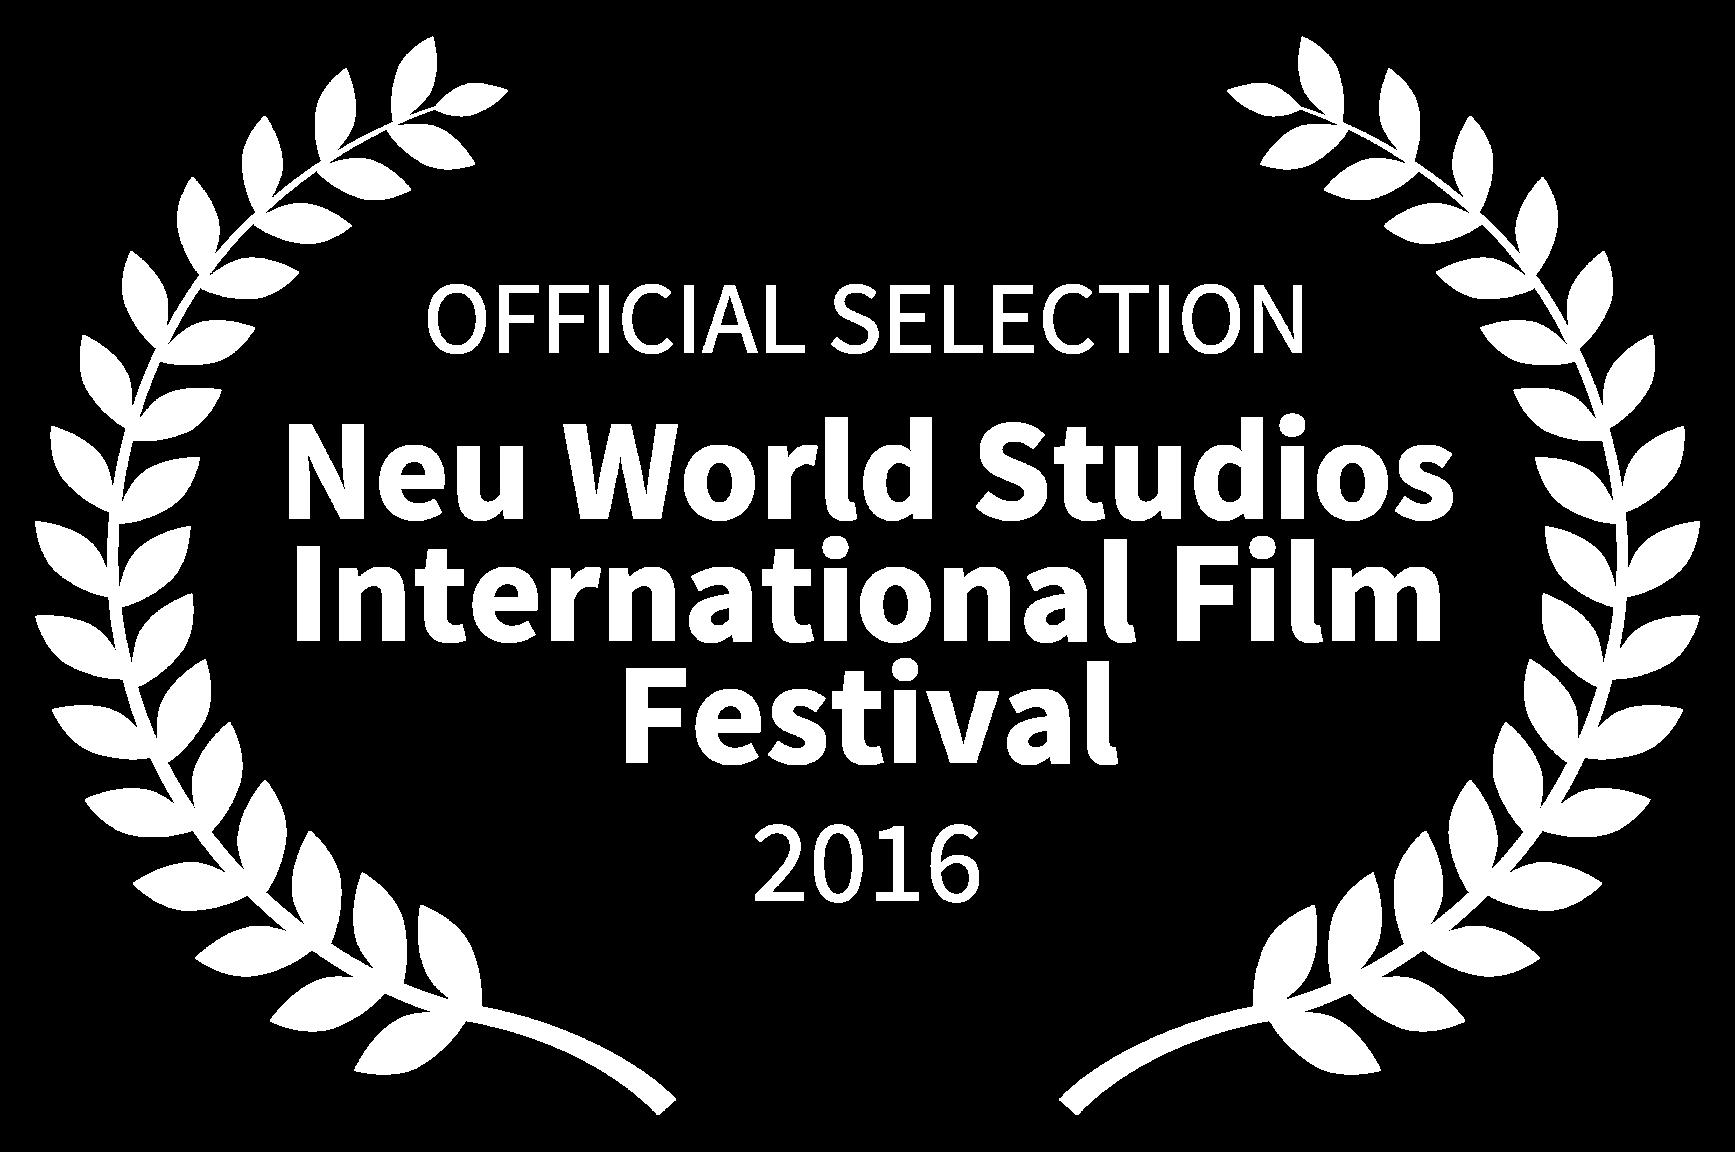 OFFICIAL SELECTION - Neu World Studios International Film Festival - 2016.png